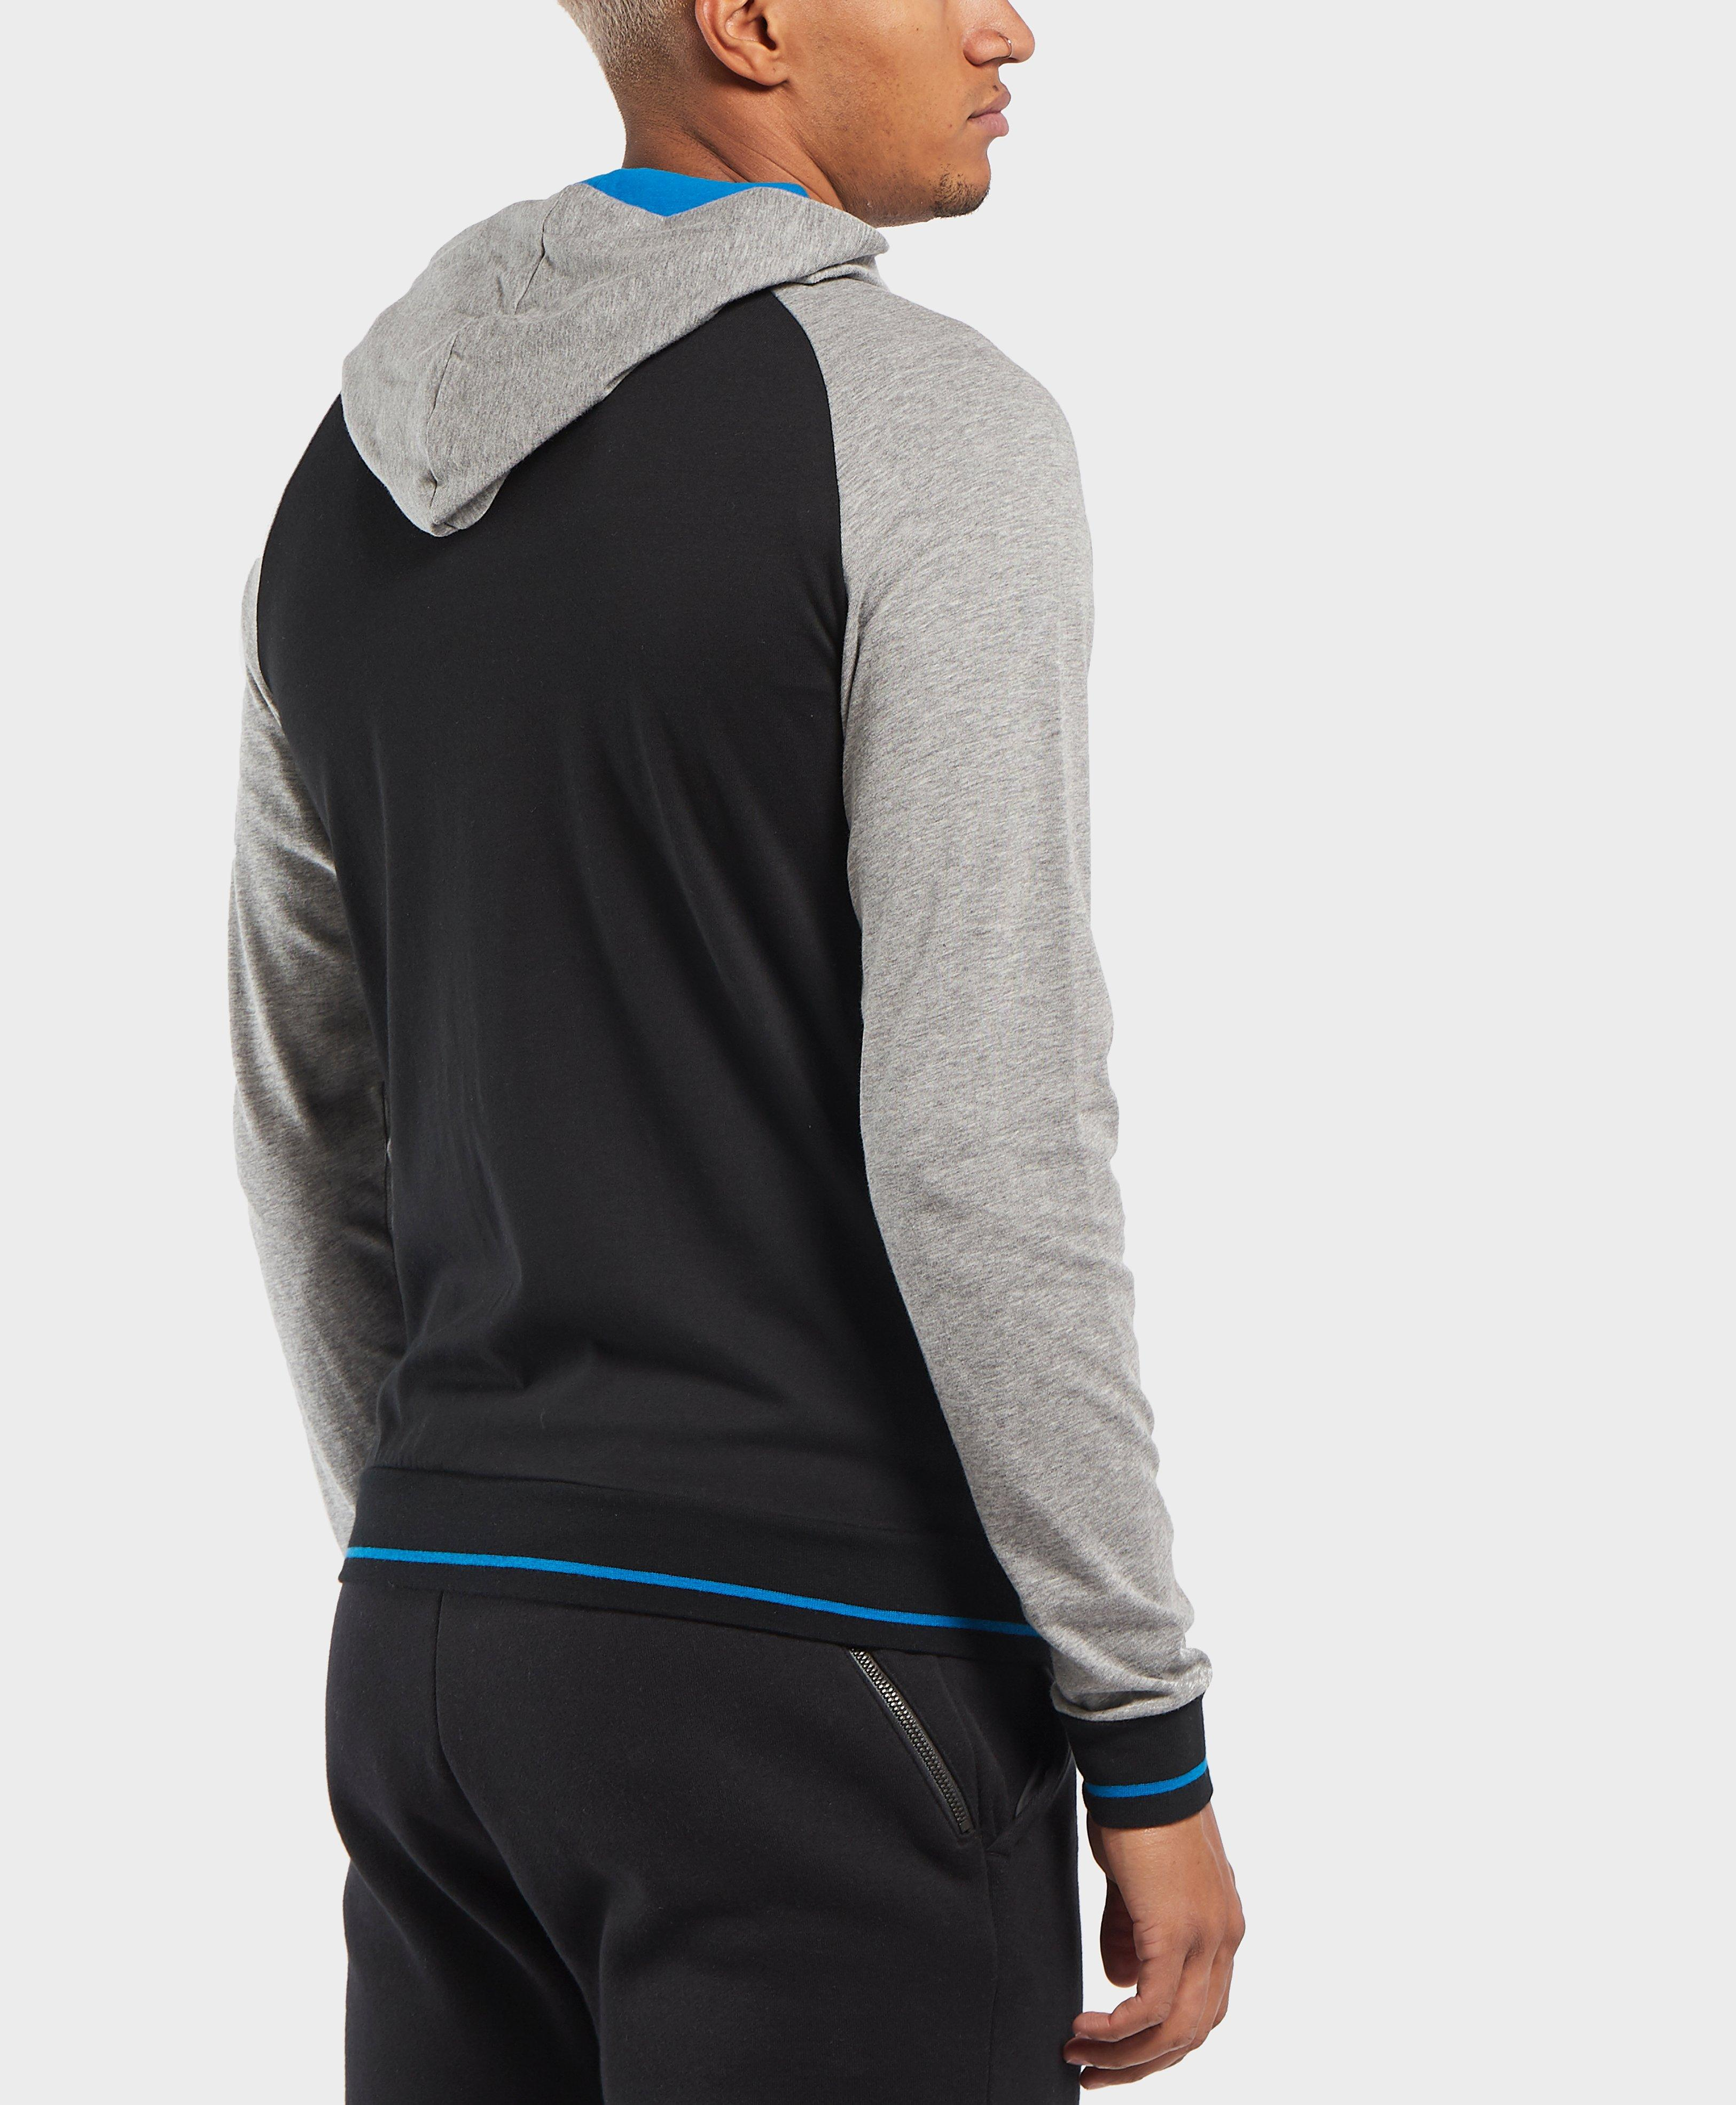 ebf4ef7b BOSS Authentic Full Zip Hoodie in Black for Men - Lyst